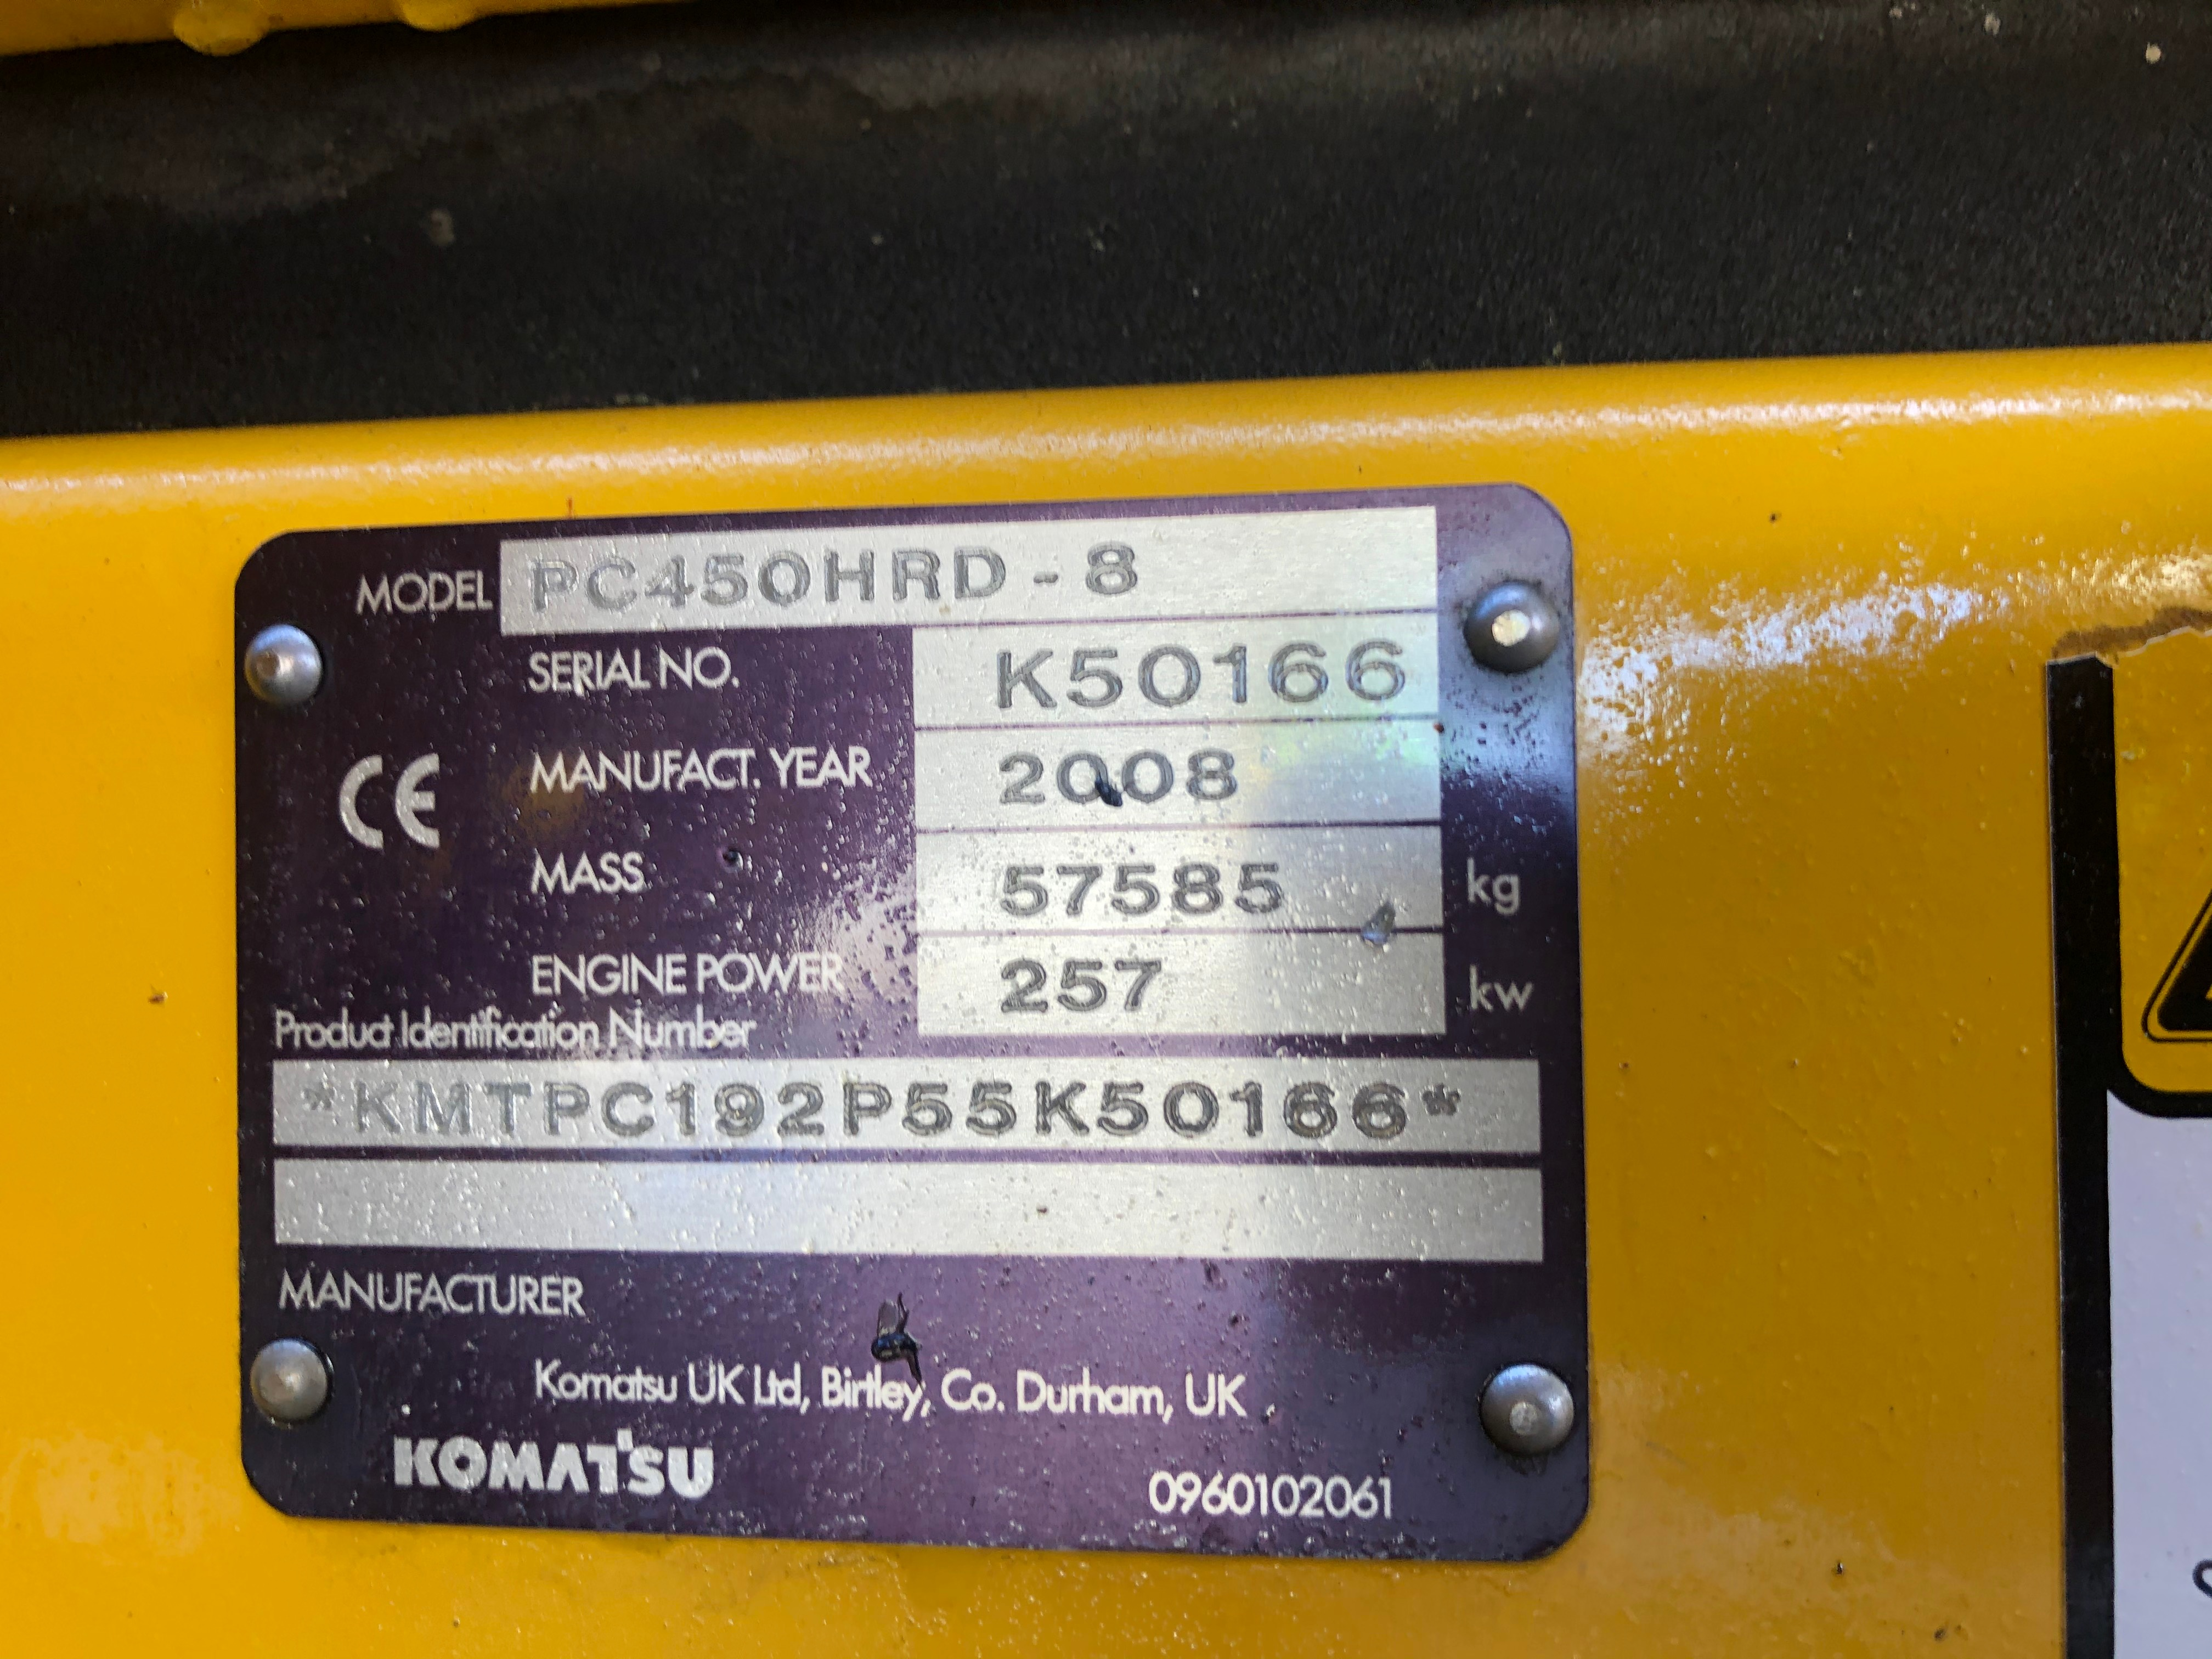 Used 2008 Komatsu PC450HRD-8 For Sale